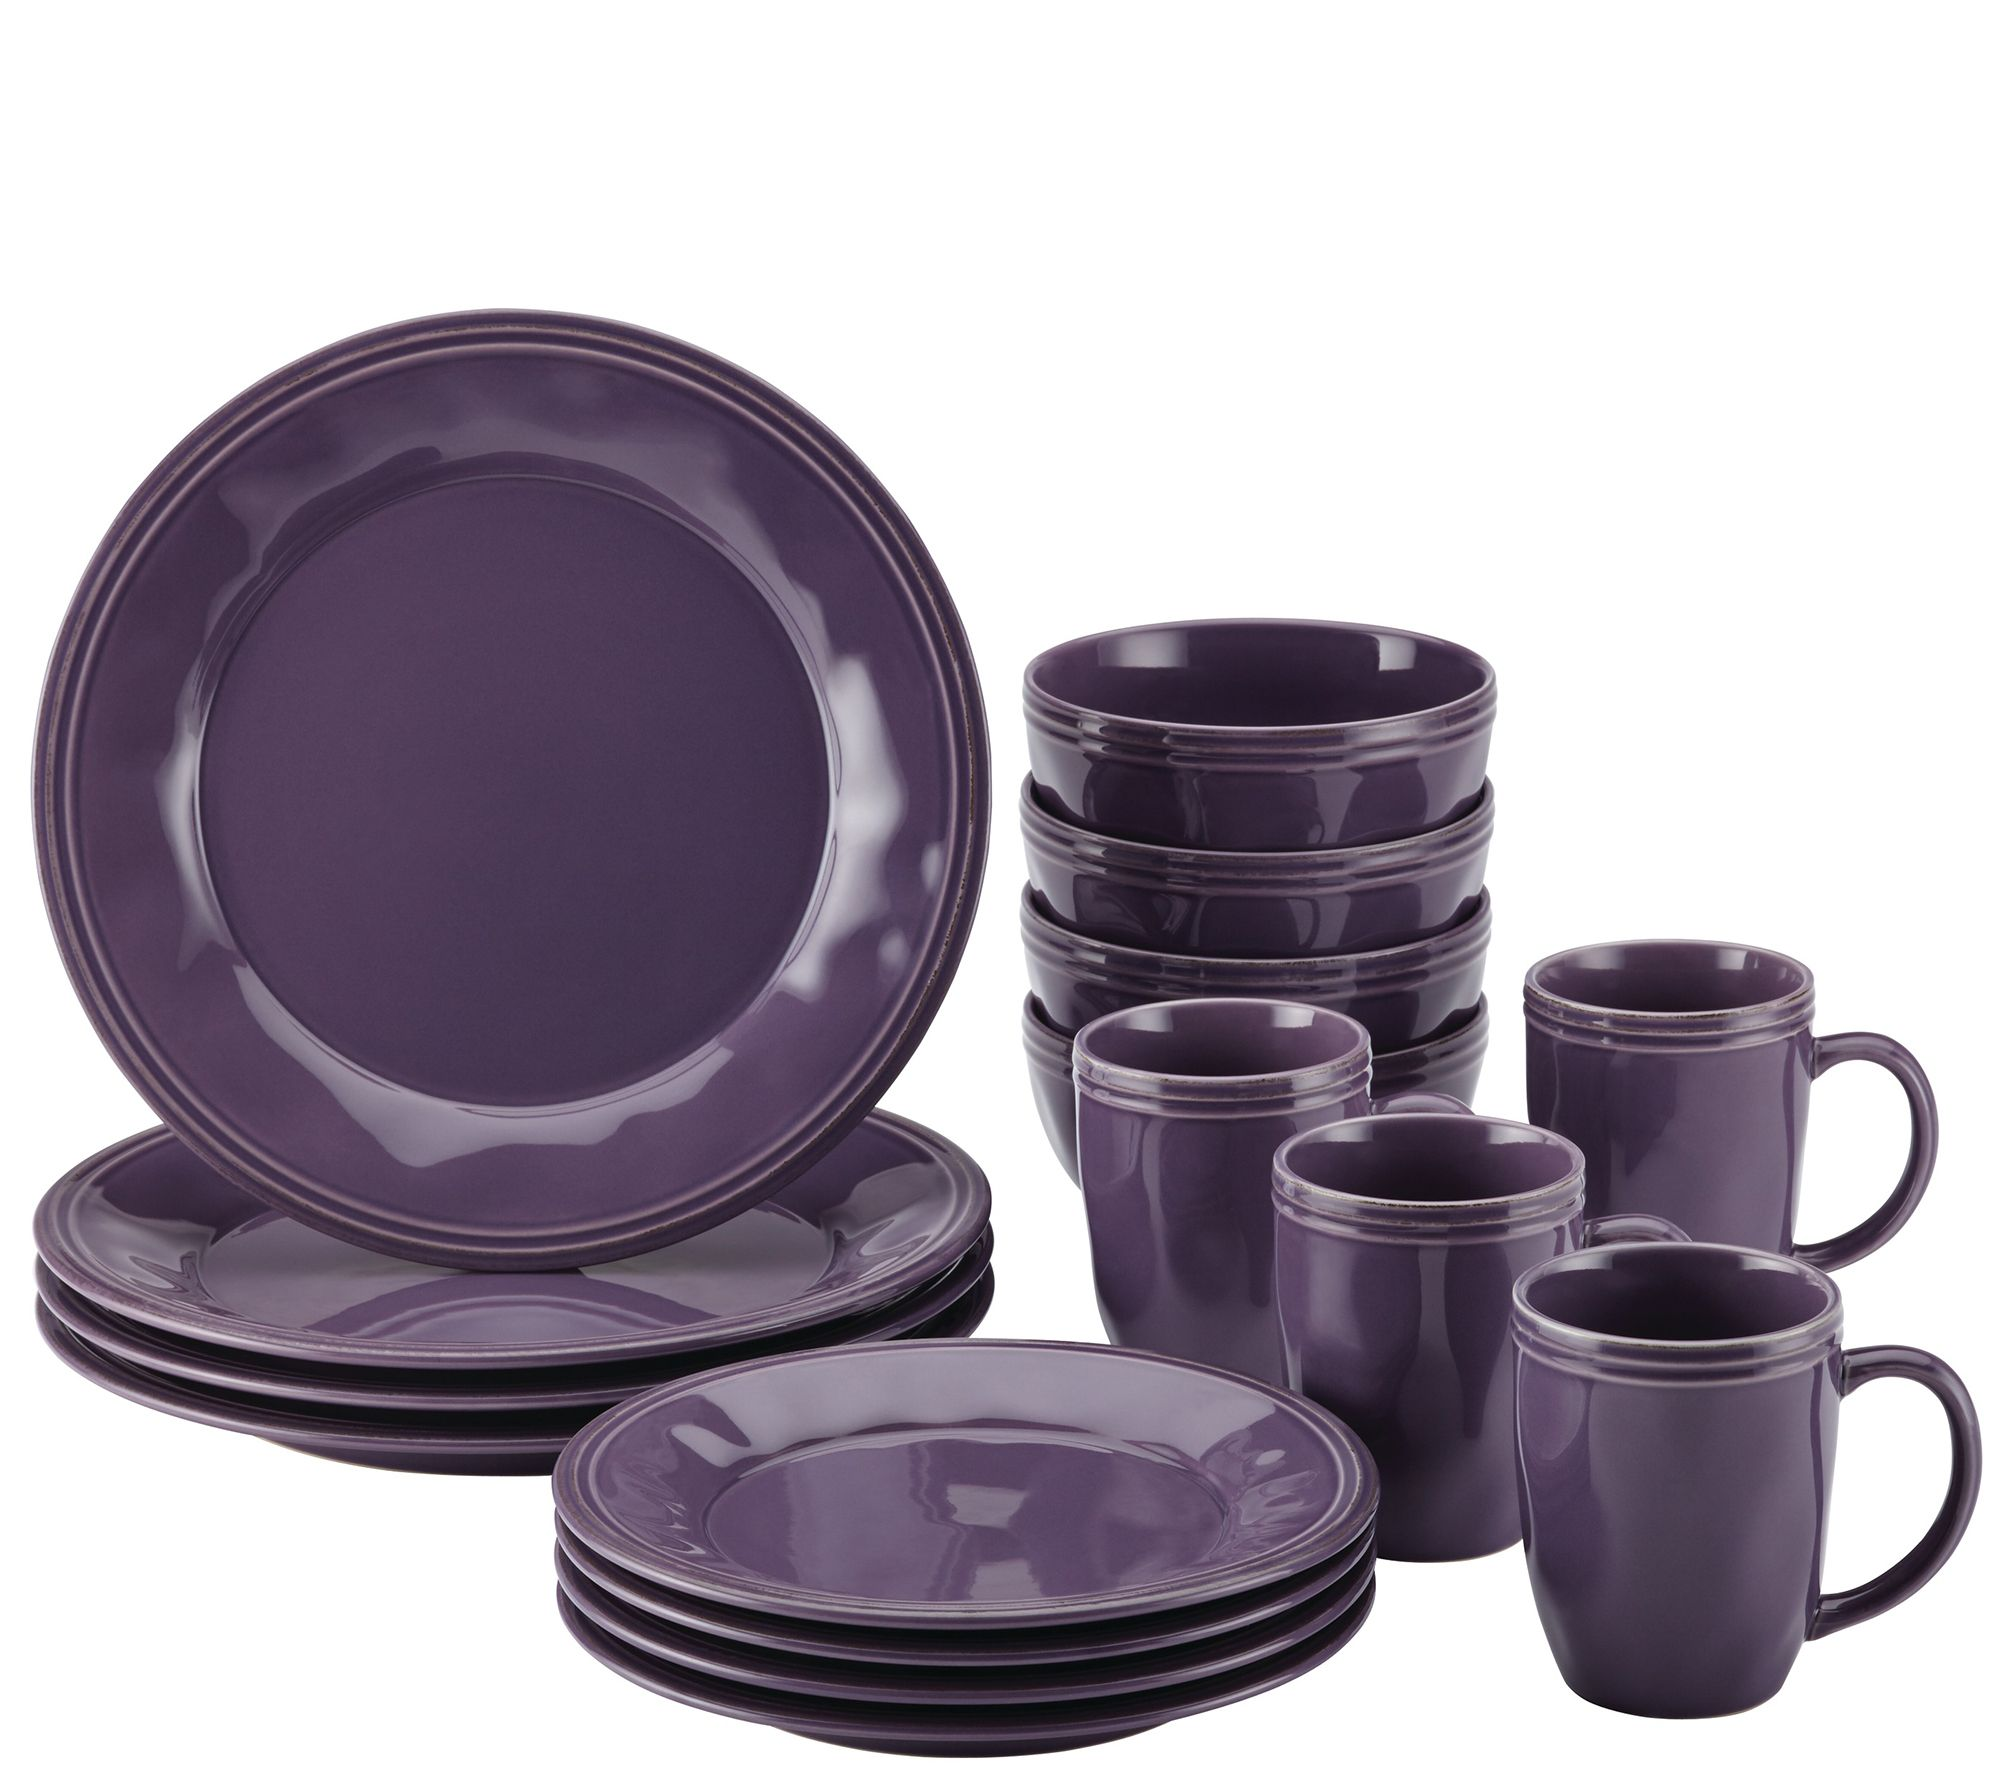 Rachael Ray Cucina 16-Piece Stoneware Dinnerware Set - Page 1 ...